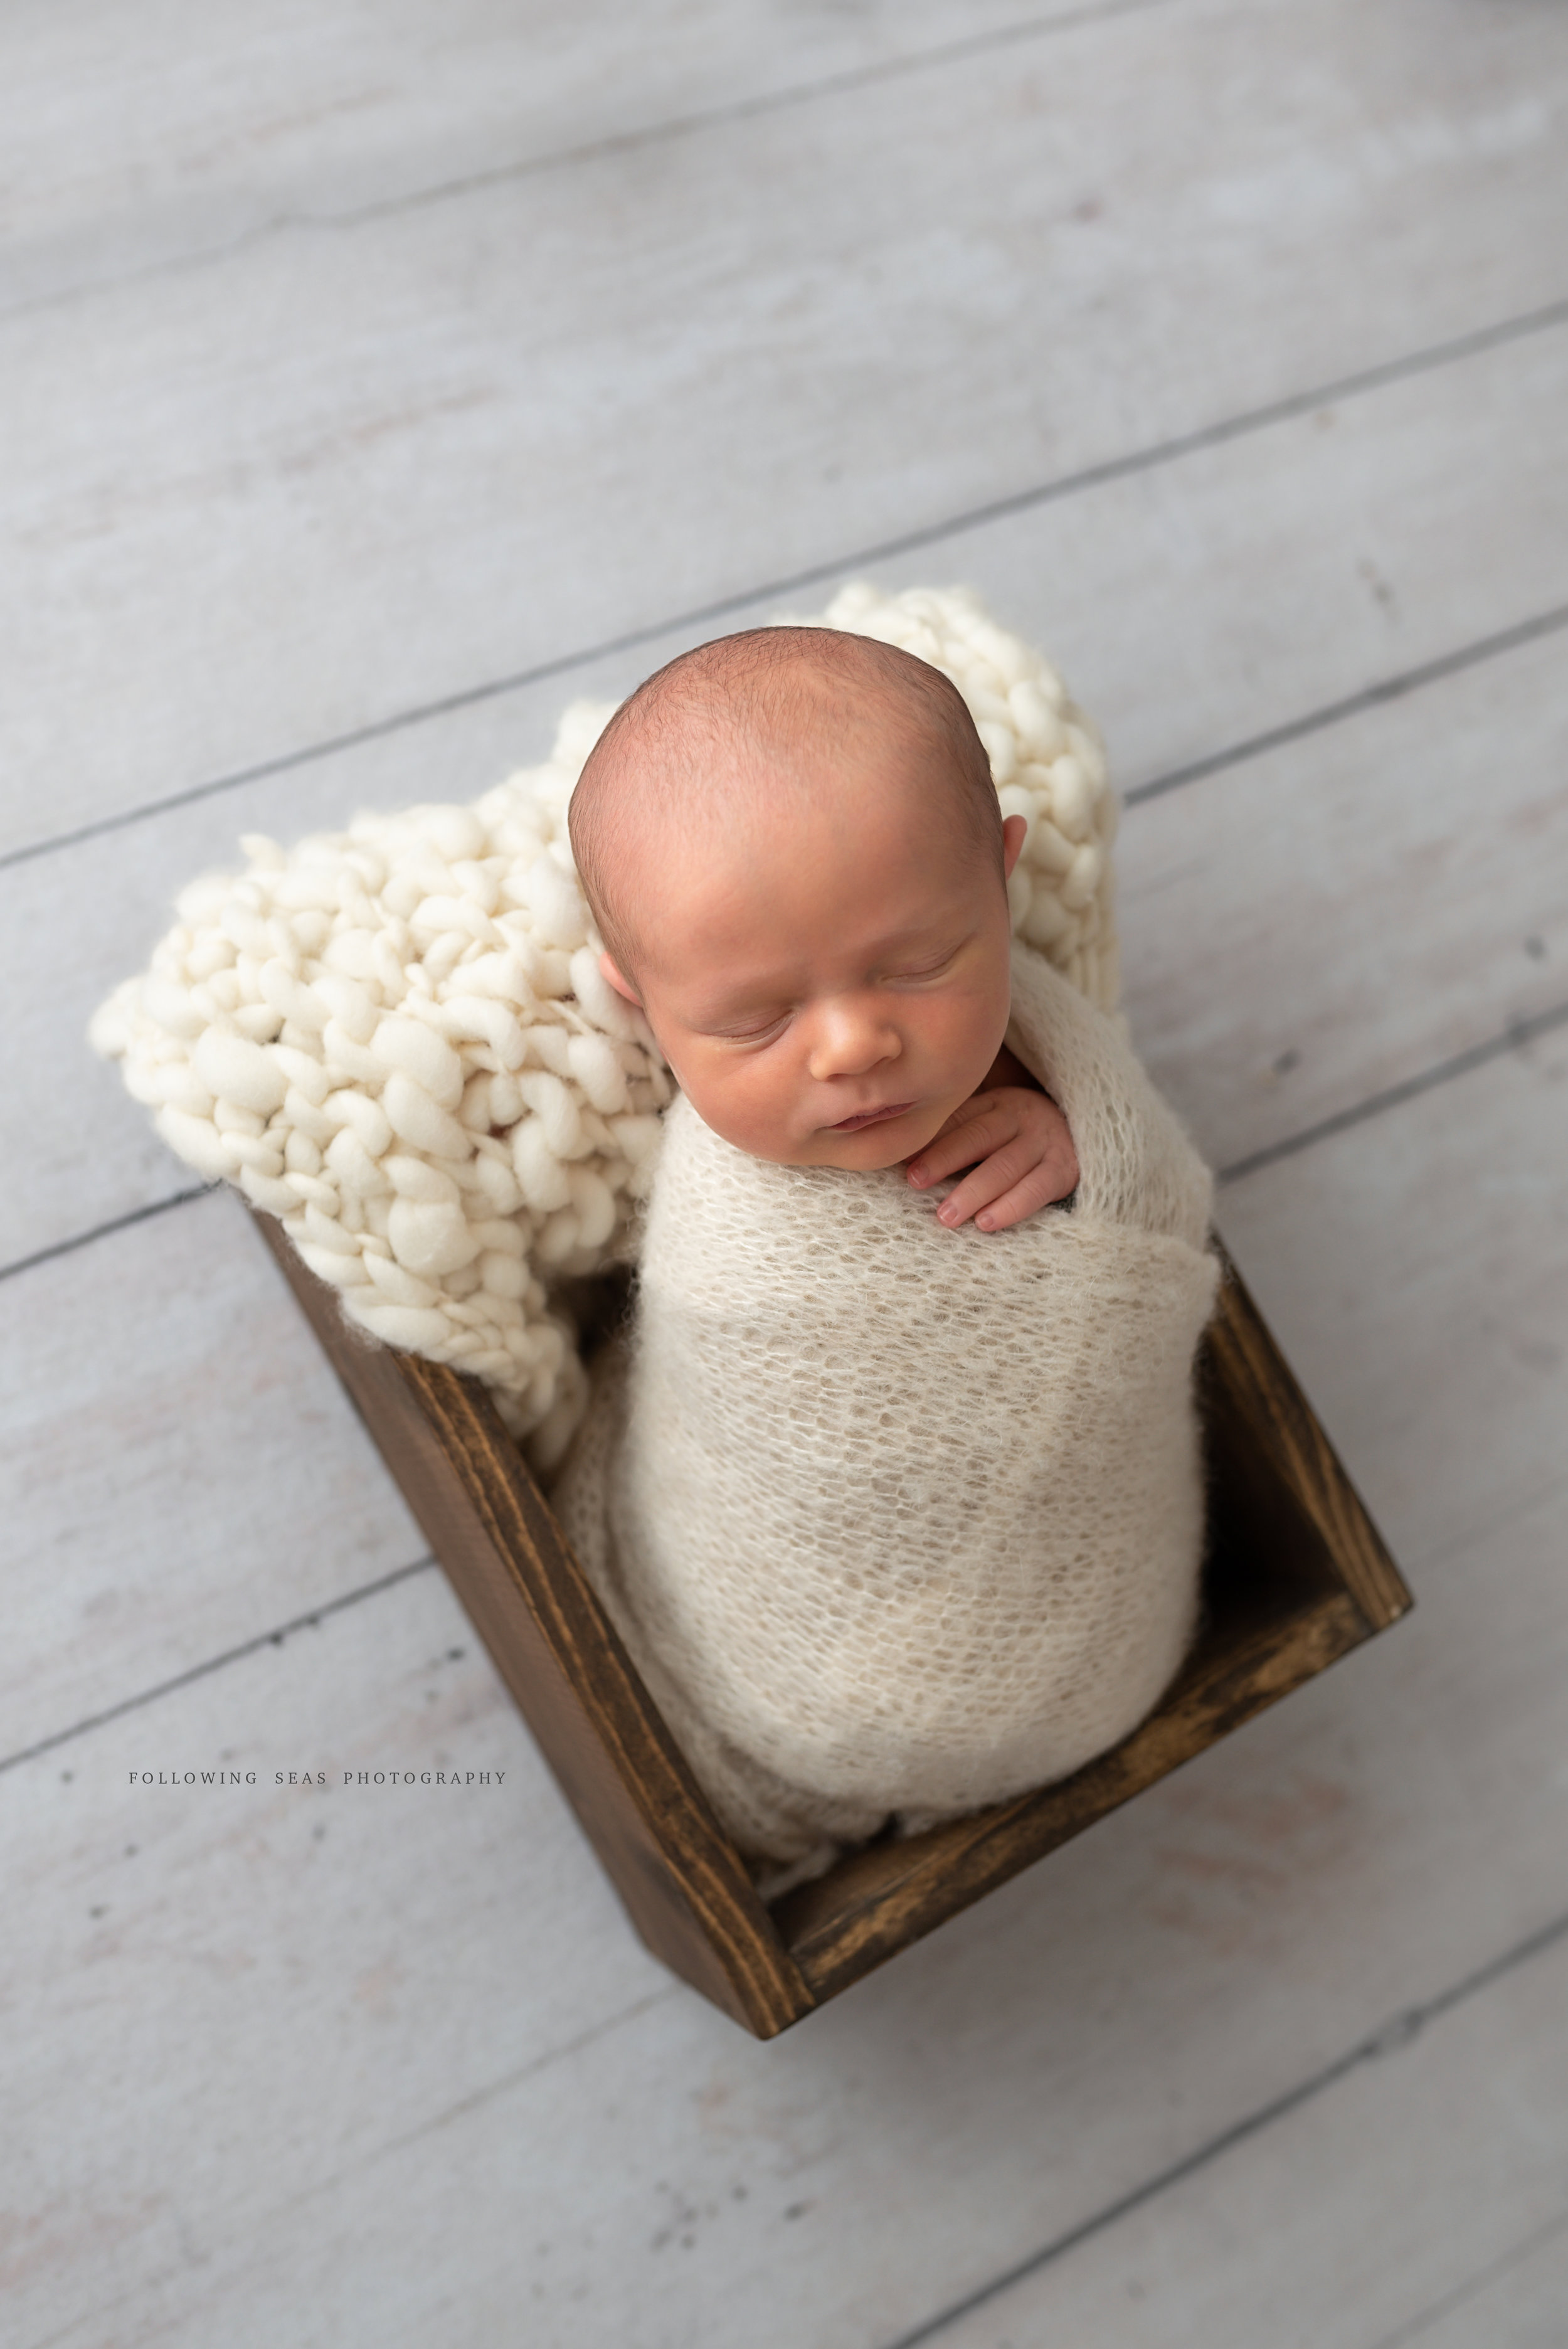 Charleston-Newborn-Photographer-Following-Seas-Photography-FSP_1334.jpg